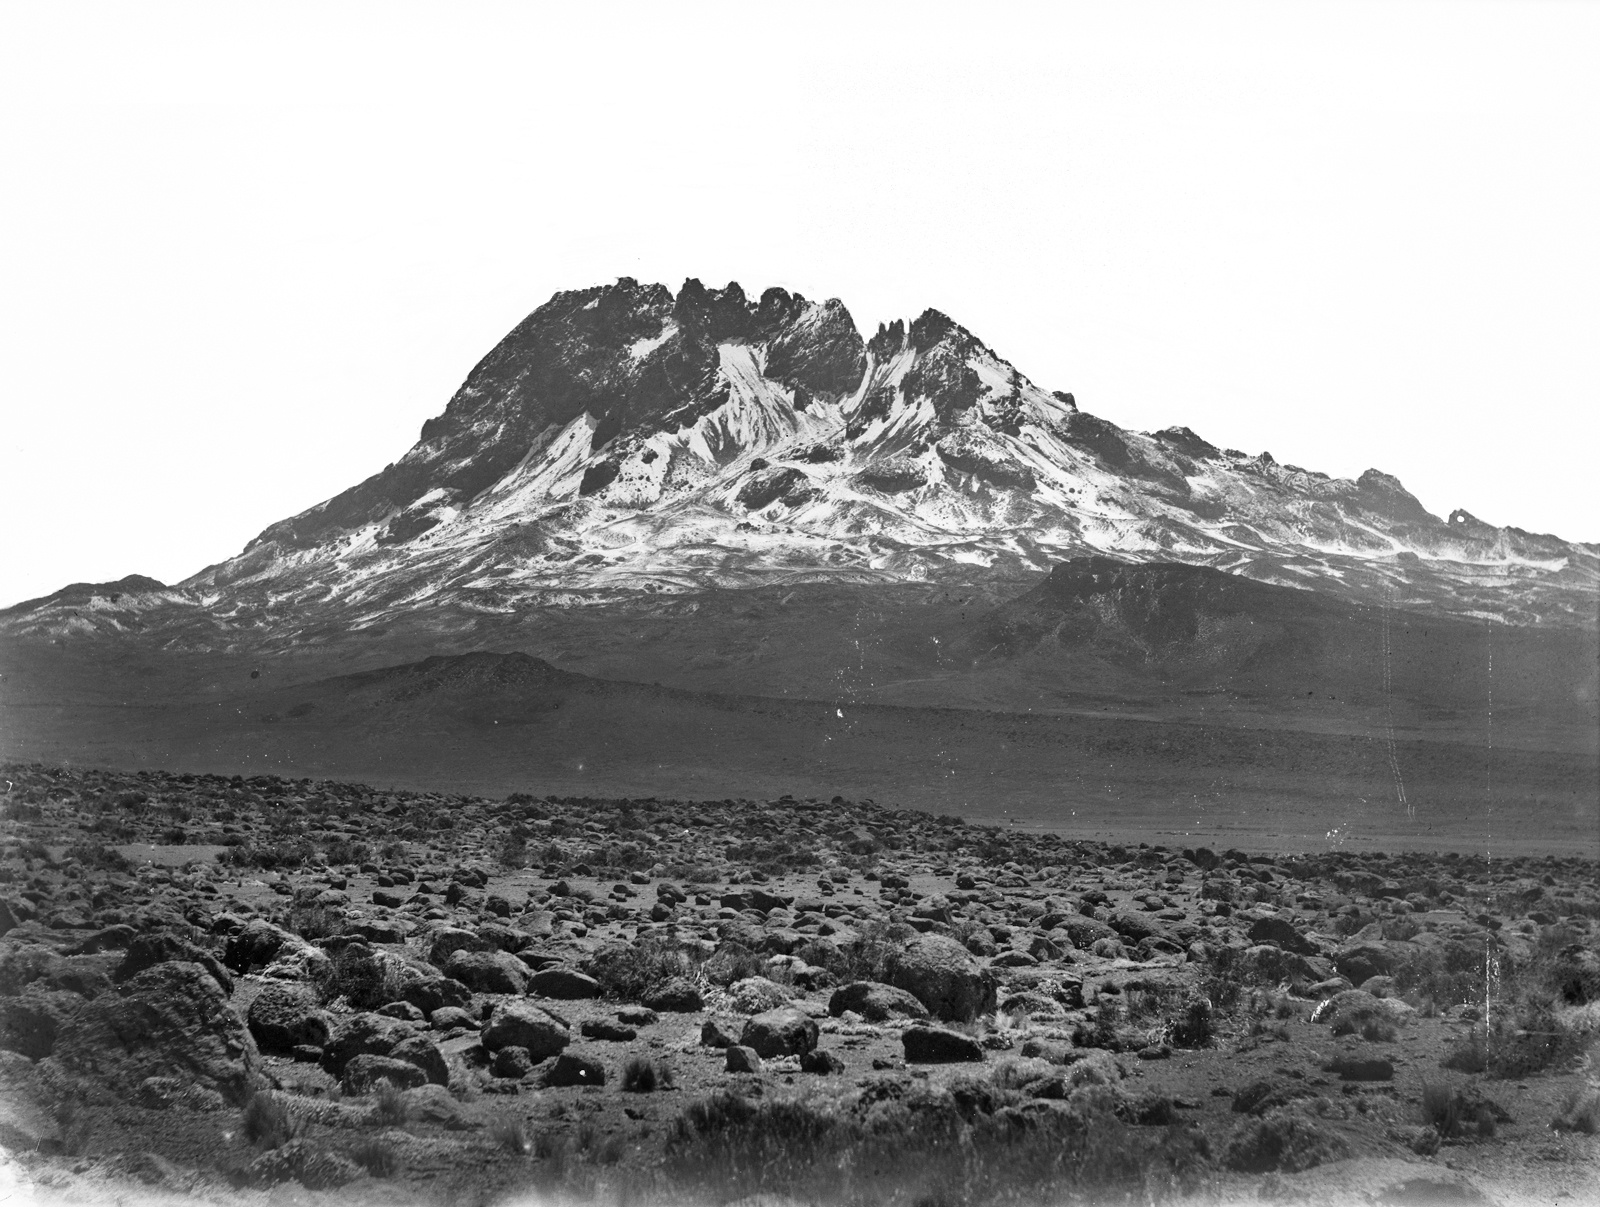 28. Килиманджаро. Мавенси со свежим снегом